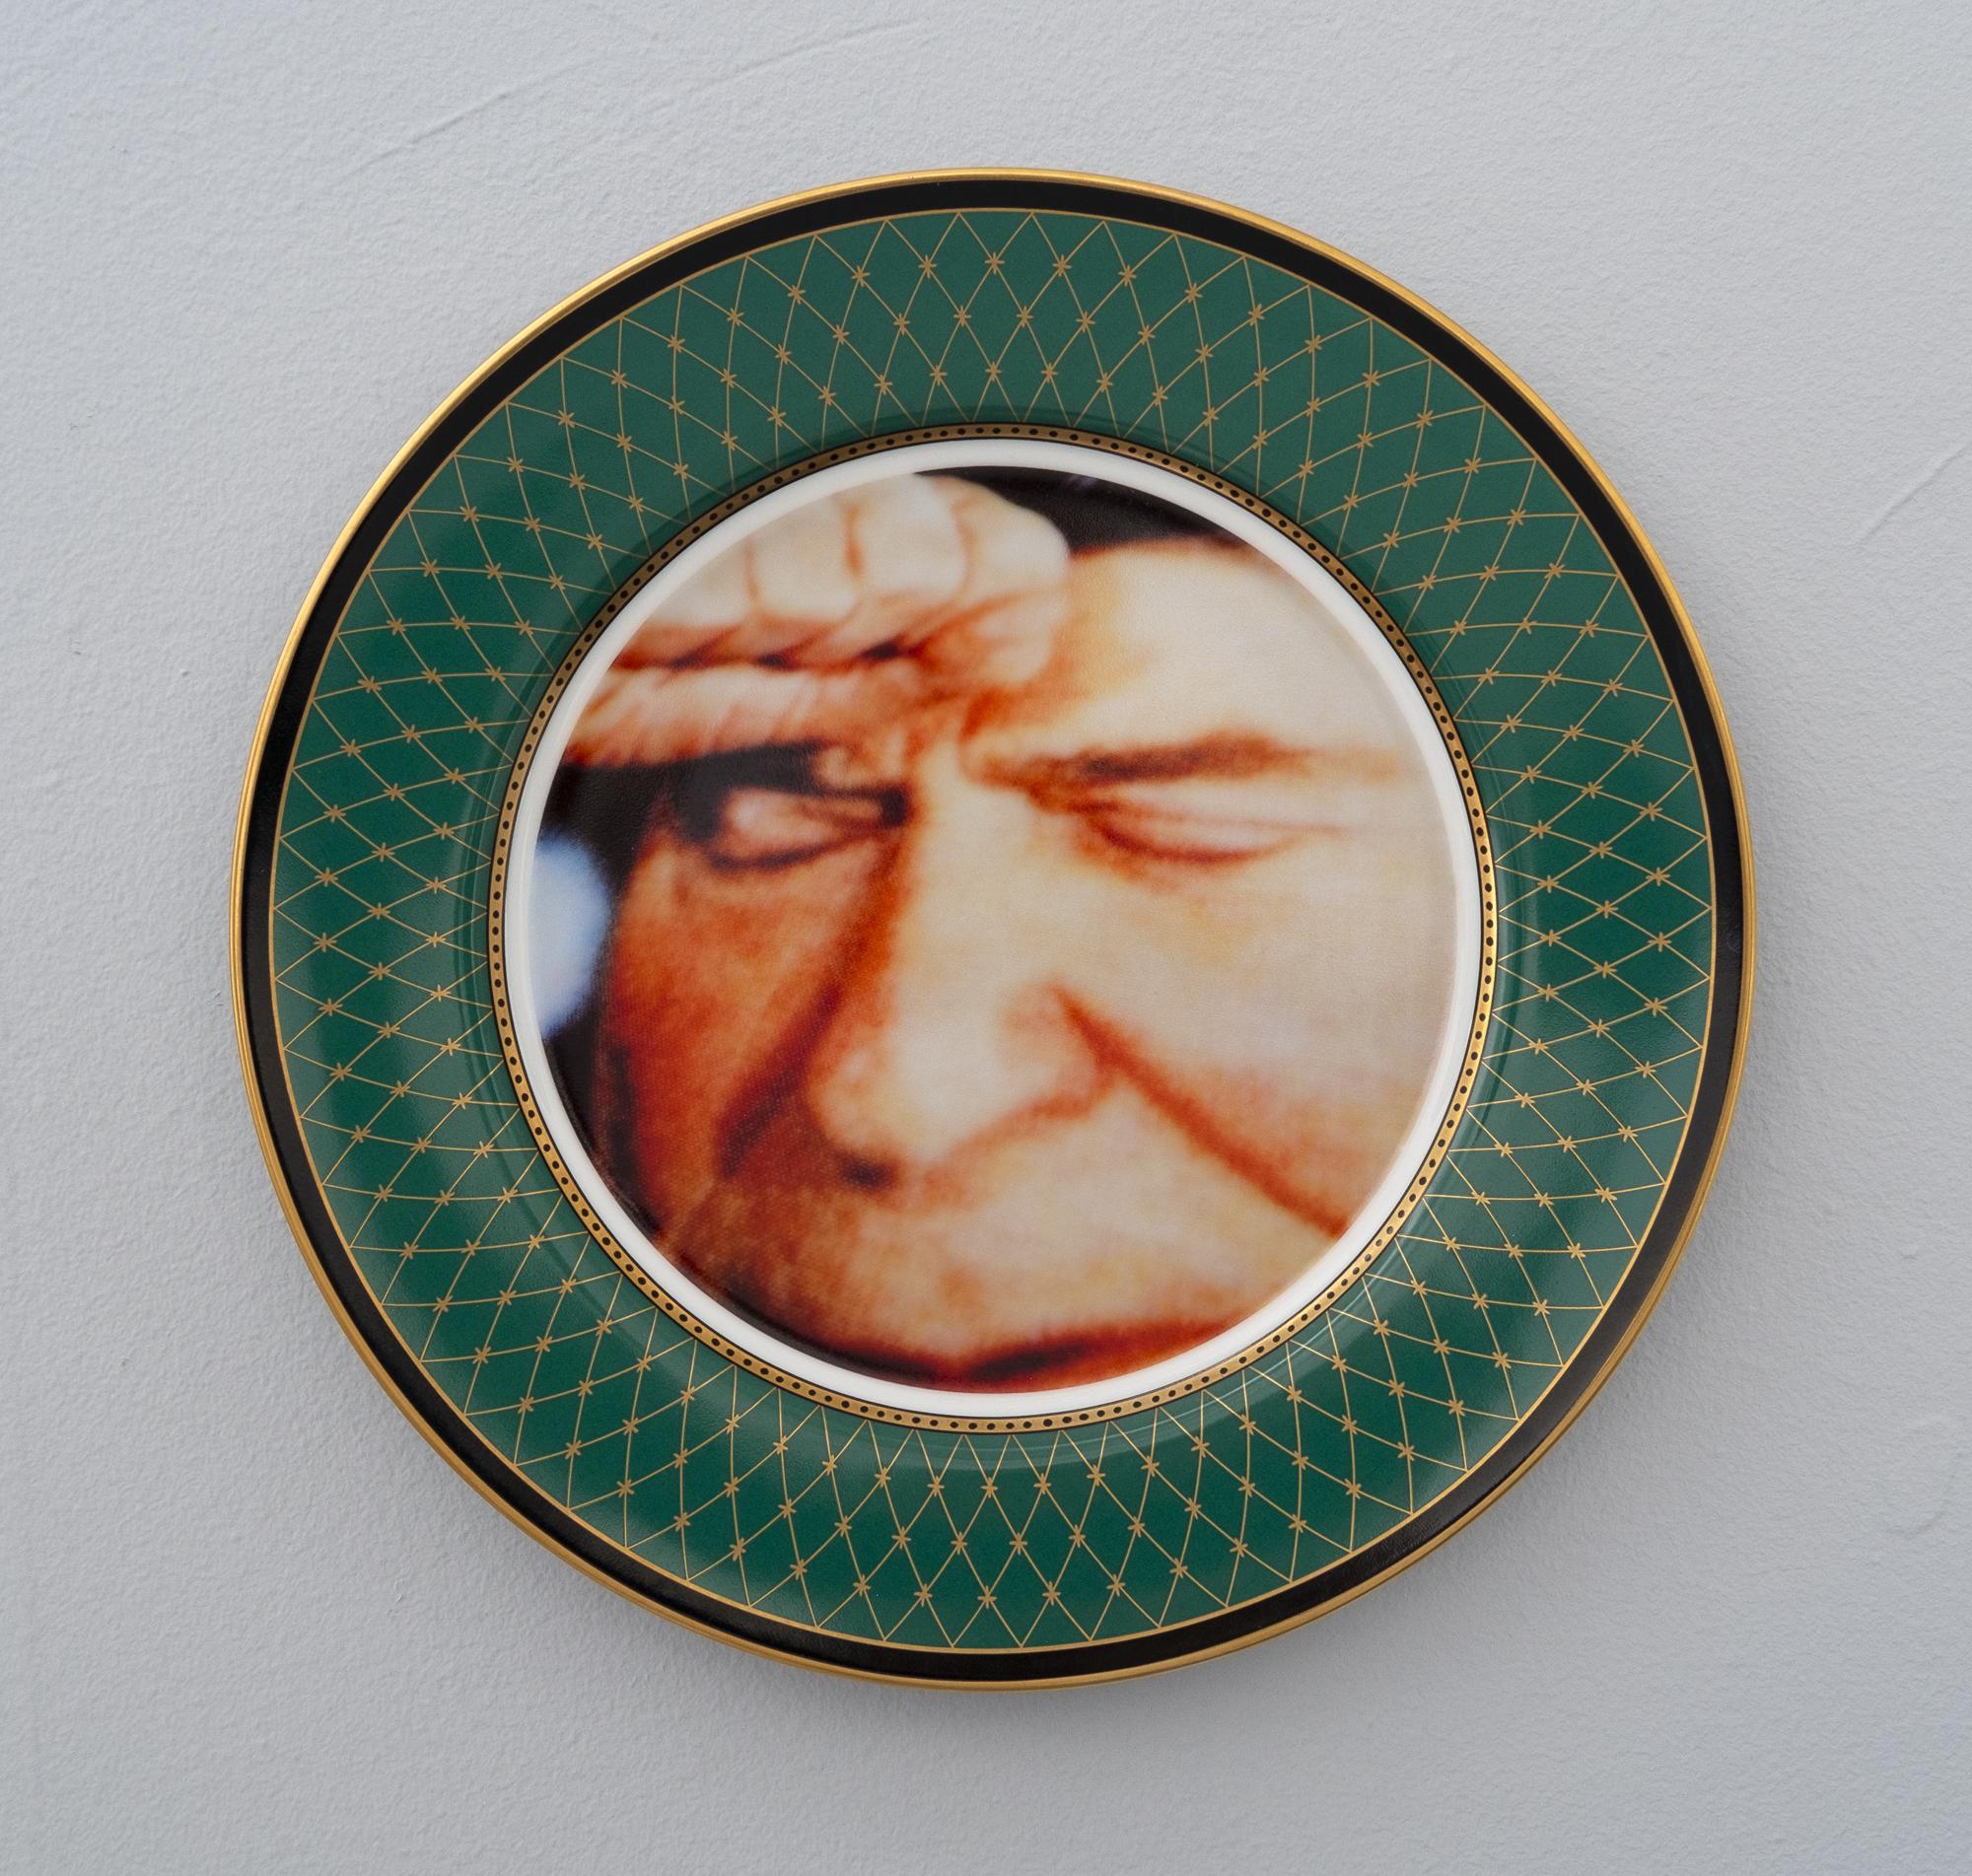 Bean Gilsdorf,  Ronald Reagan , 2018, Ceramic plate, 10.25 inch diameter